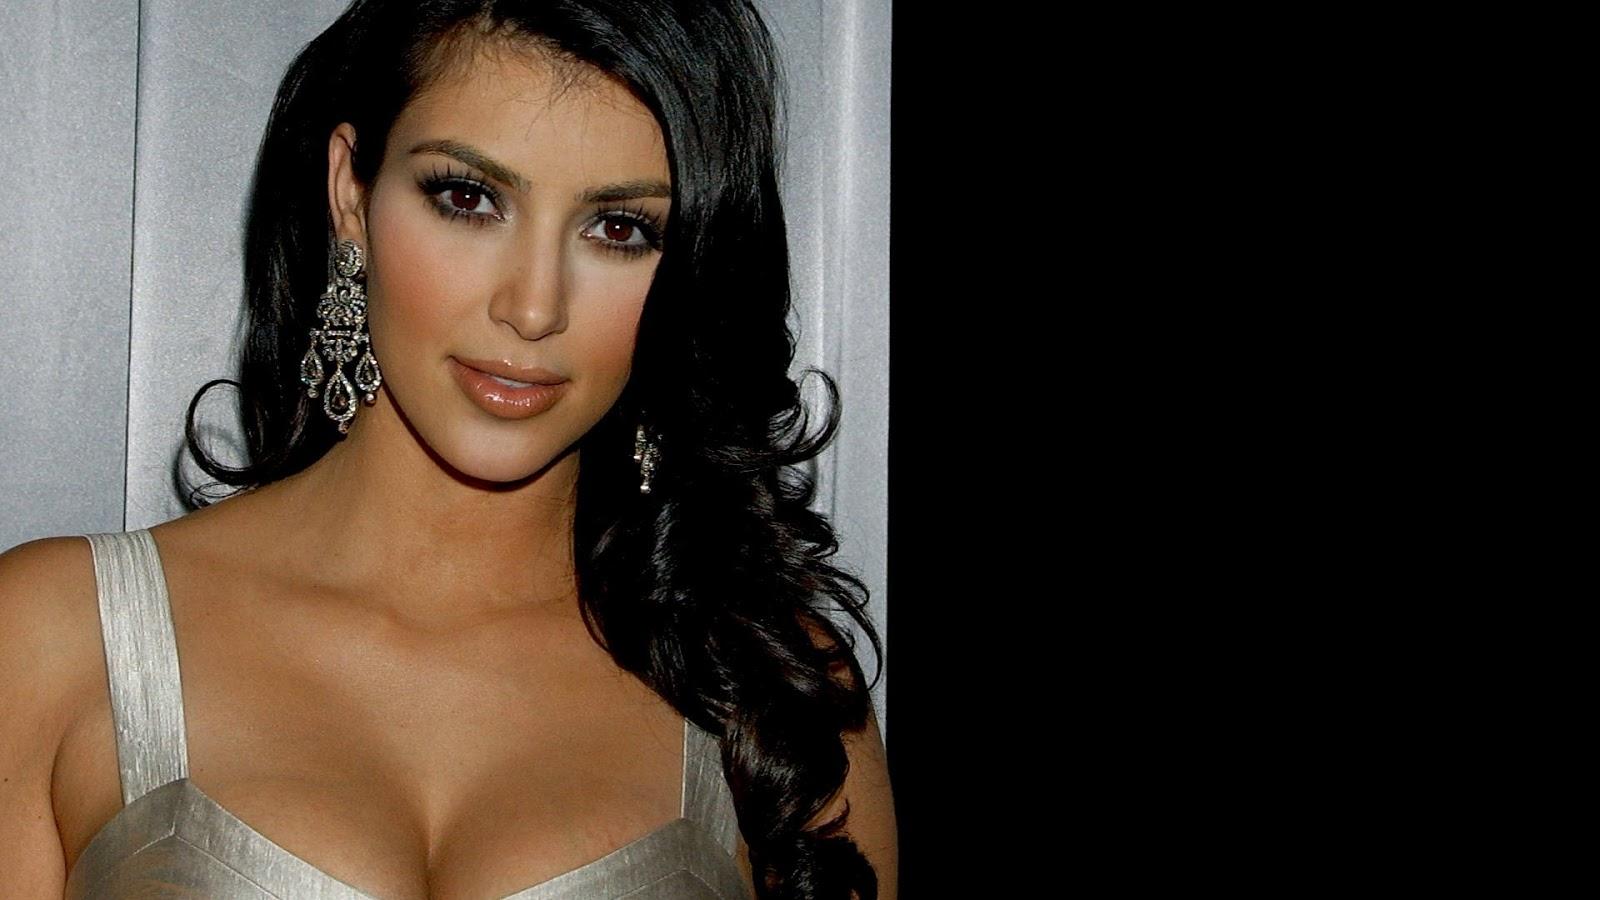 Kim Kardashian Hd Wallpapers  Wall Pc-3915